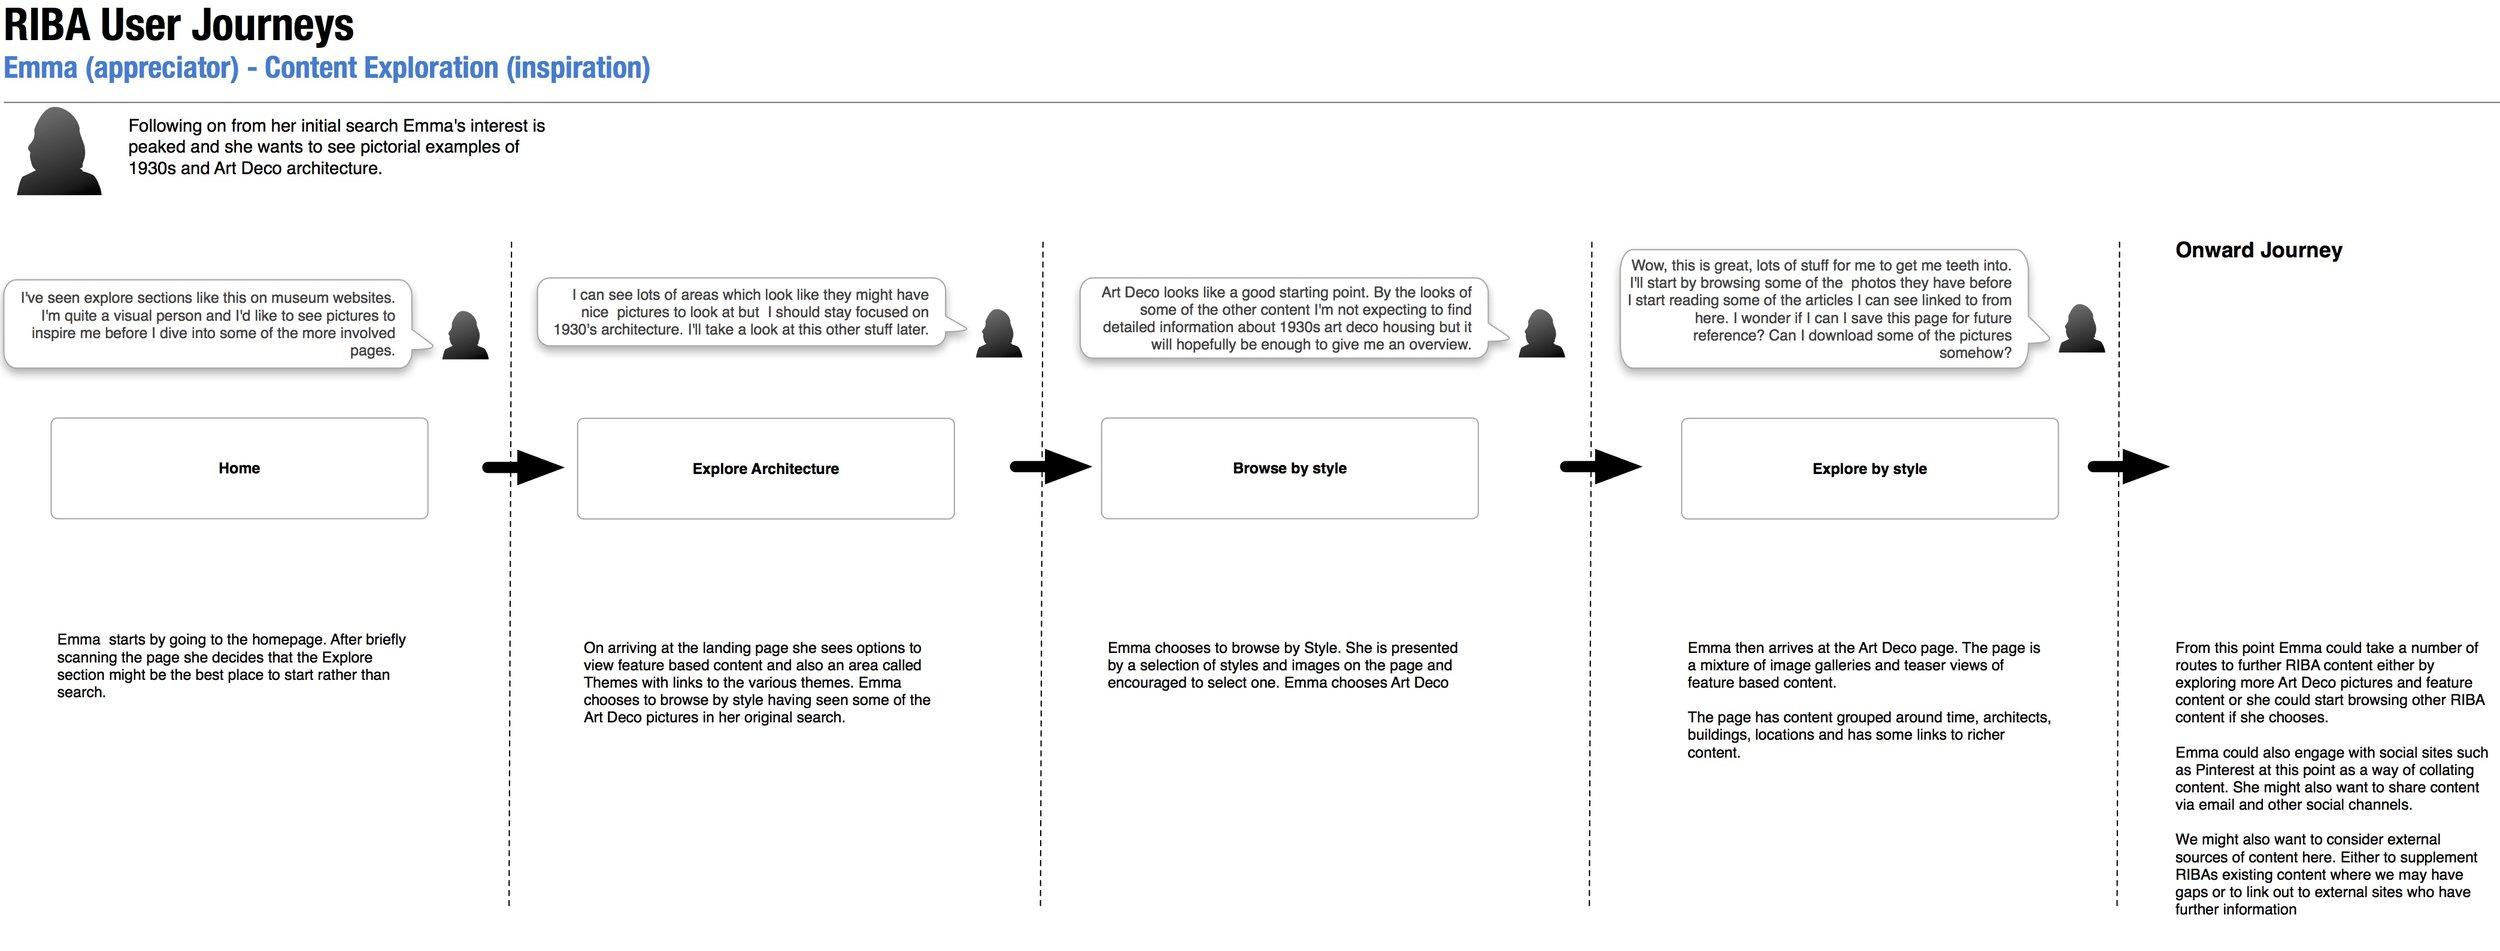 Example RIBA user journey